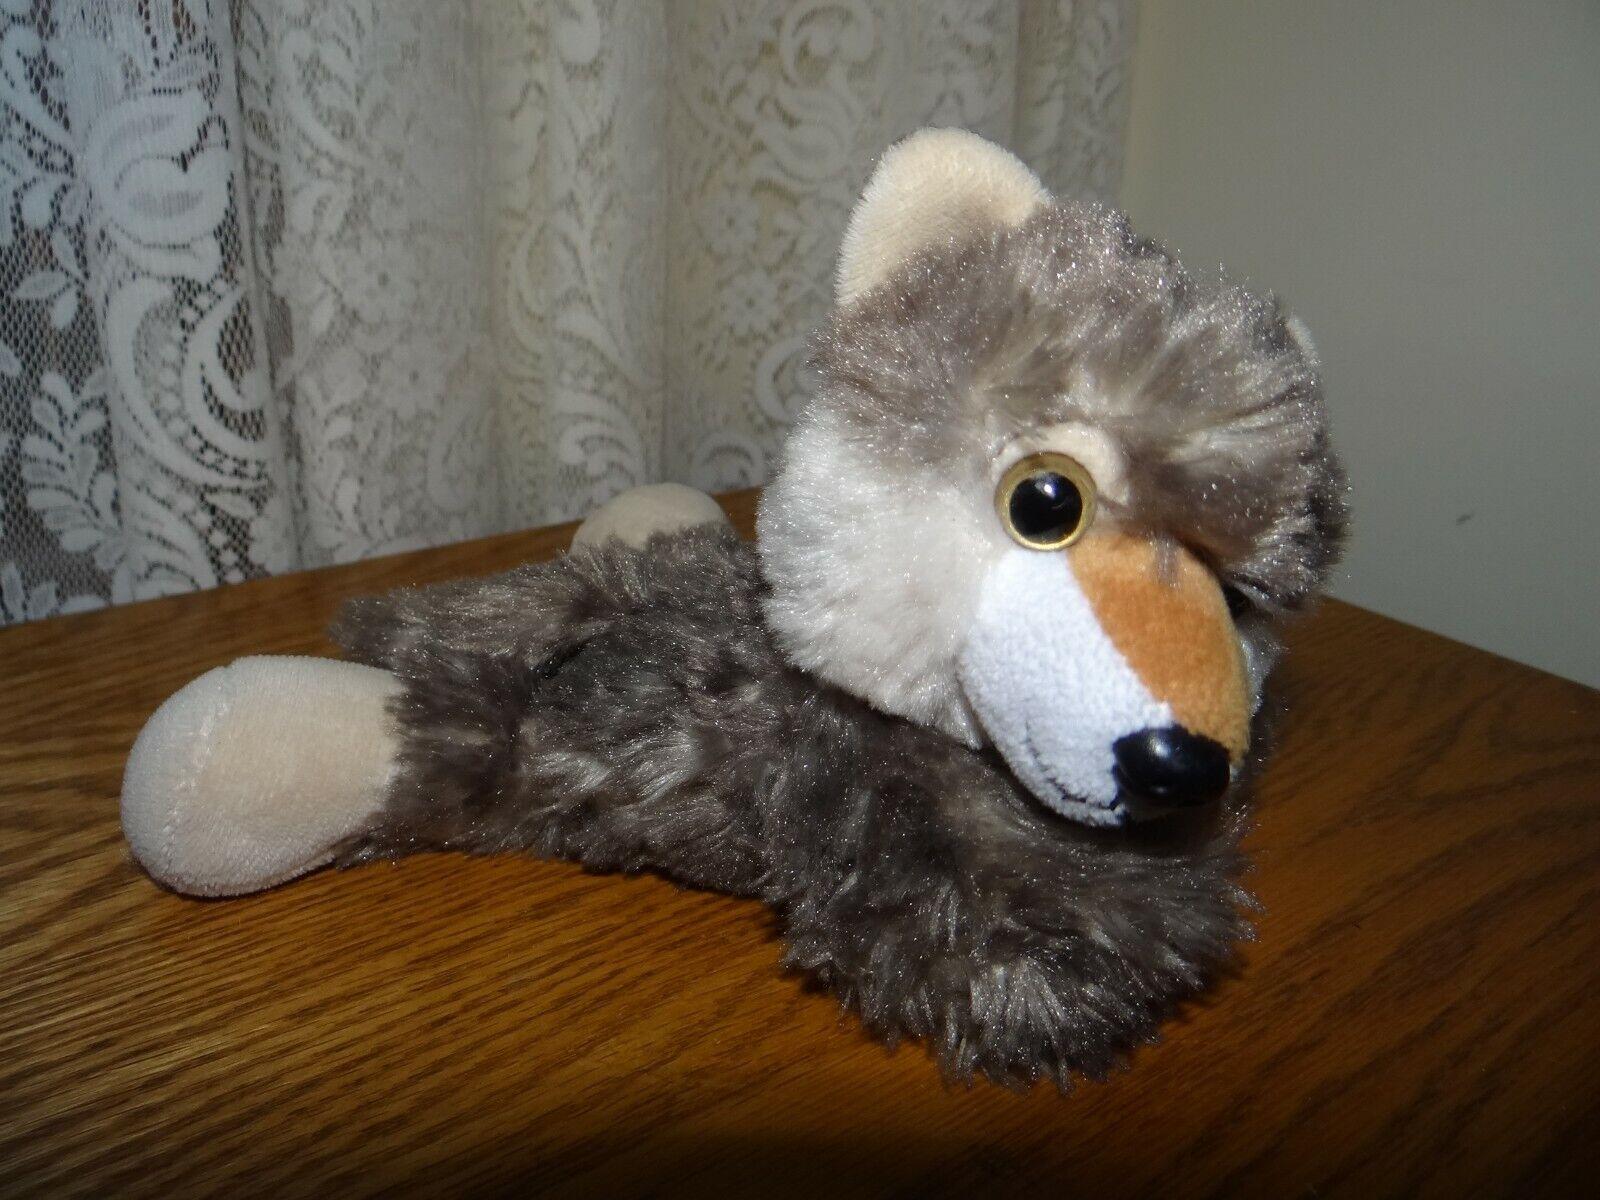 Best Stuffed Animals For Boy, Huggers Wolf Plush Slap Bracelet Plush Toy 8 Inch By Wild Republic 2017 Pre Owned